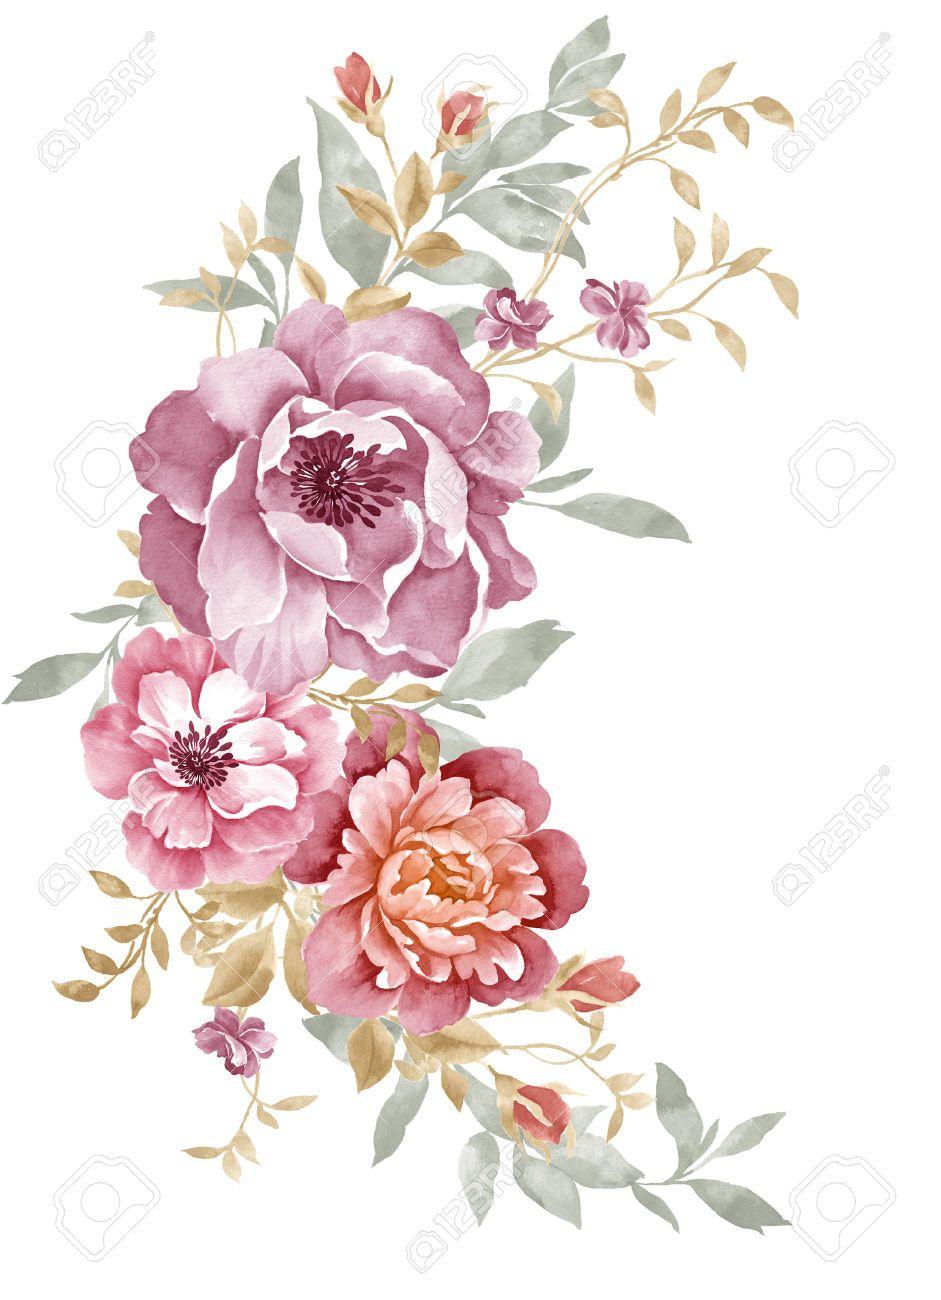 watercolor illustration flowers - Buscar con Google ...